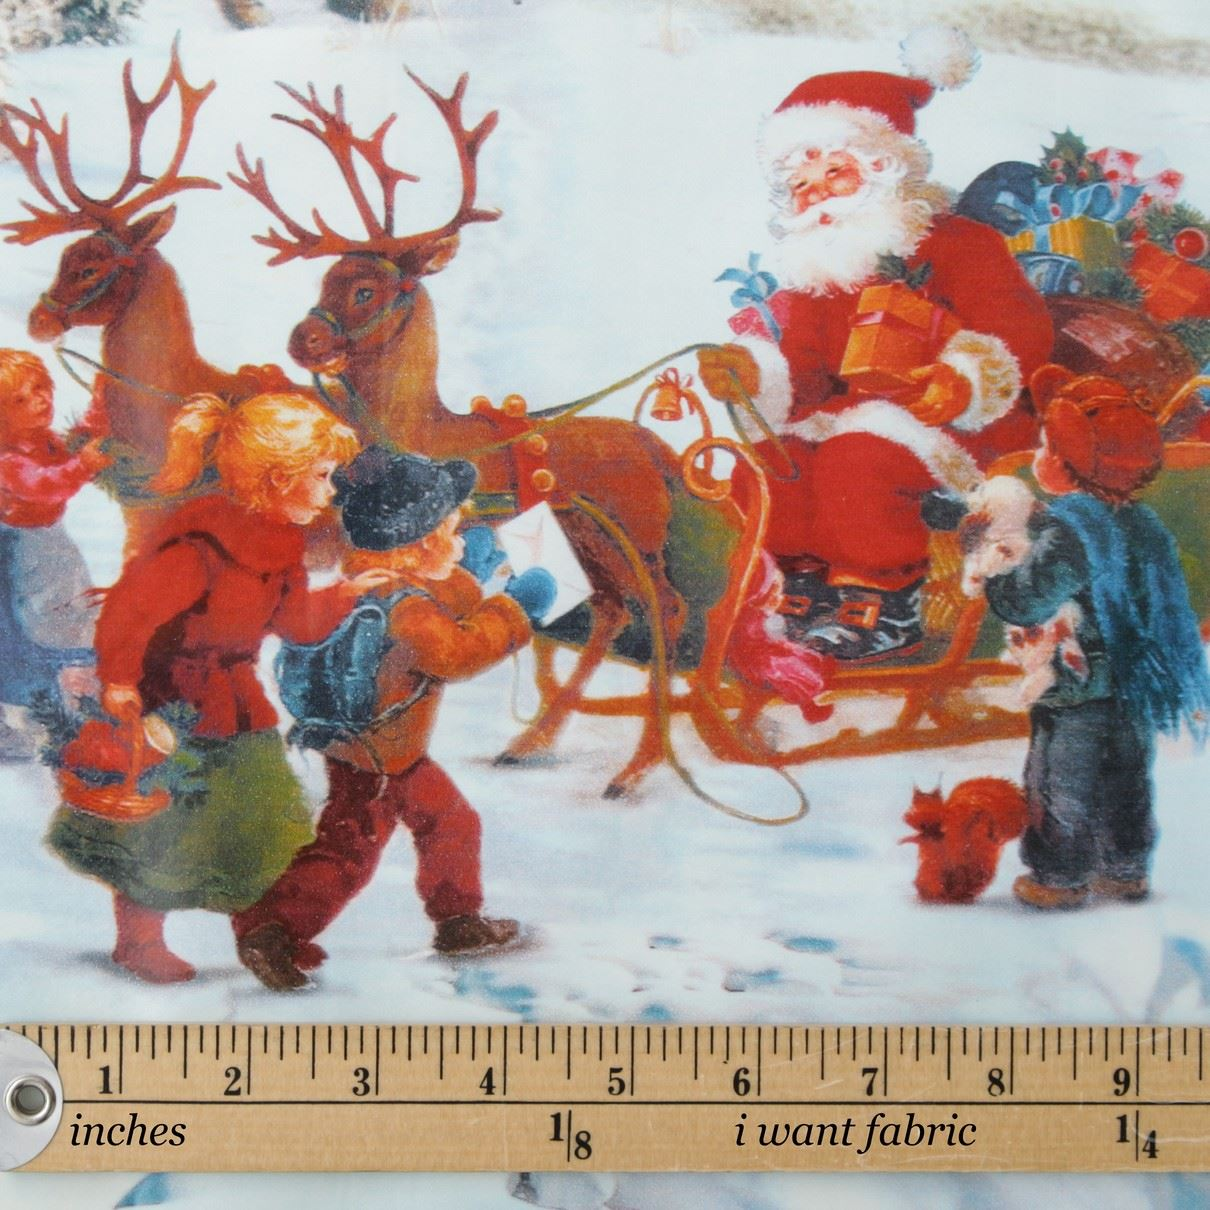 thumbnail 11 - CHRISTMAS PVC OILCLOTH VINYL FABRIC XMAS KITCHEN TABLE WIPECLEAN TABLECLOTHS